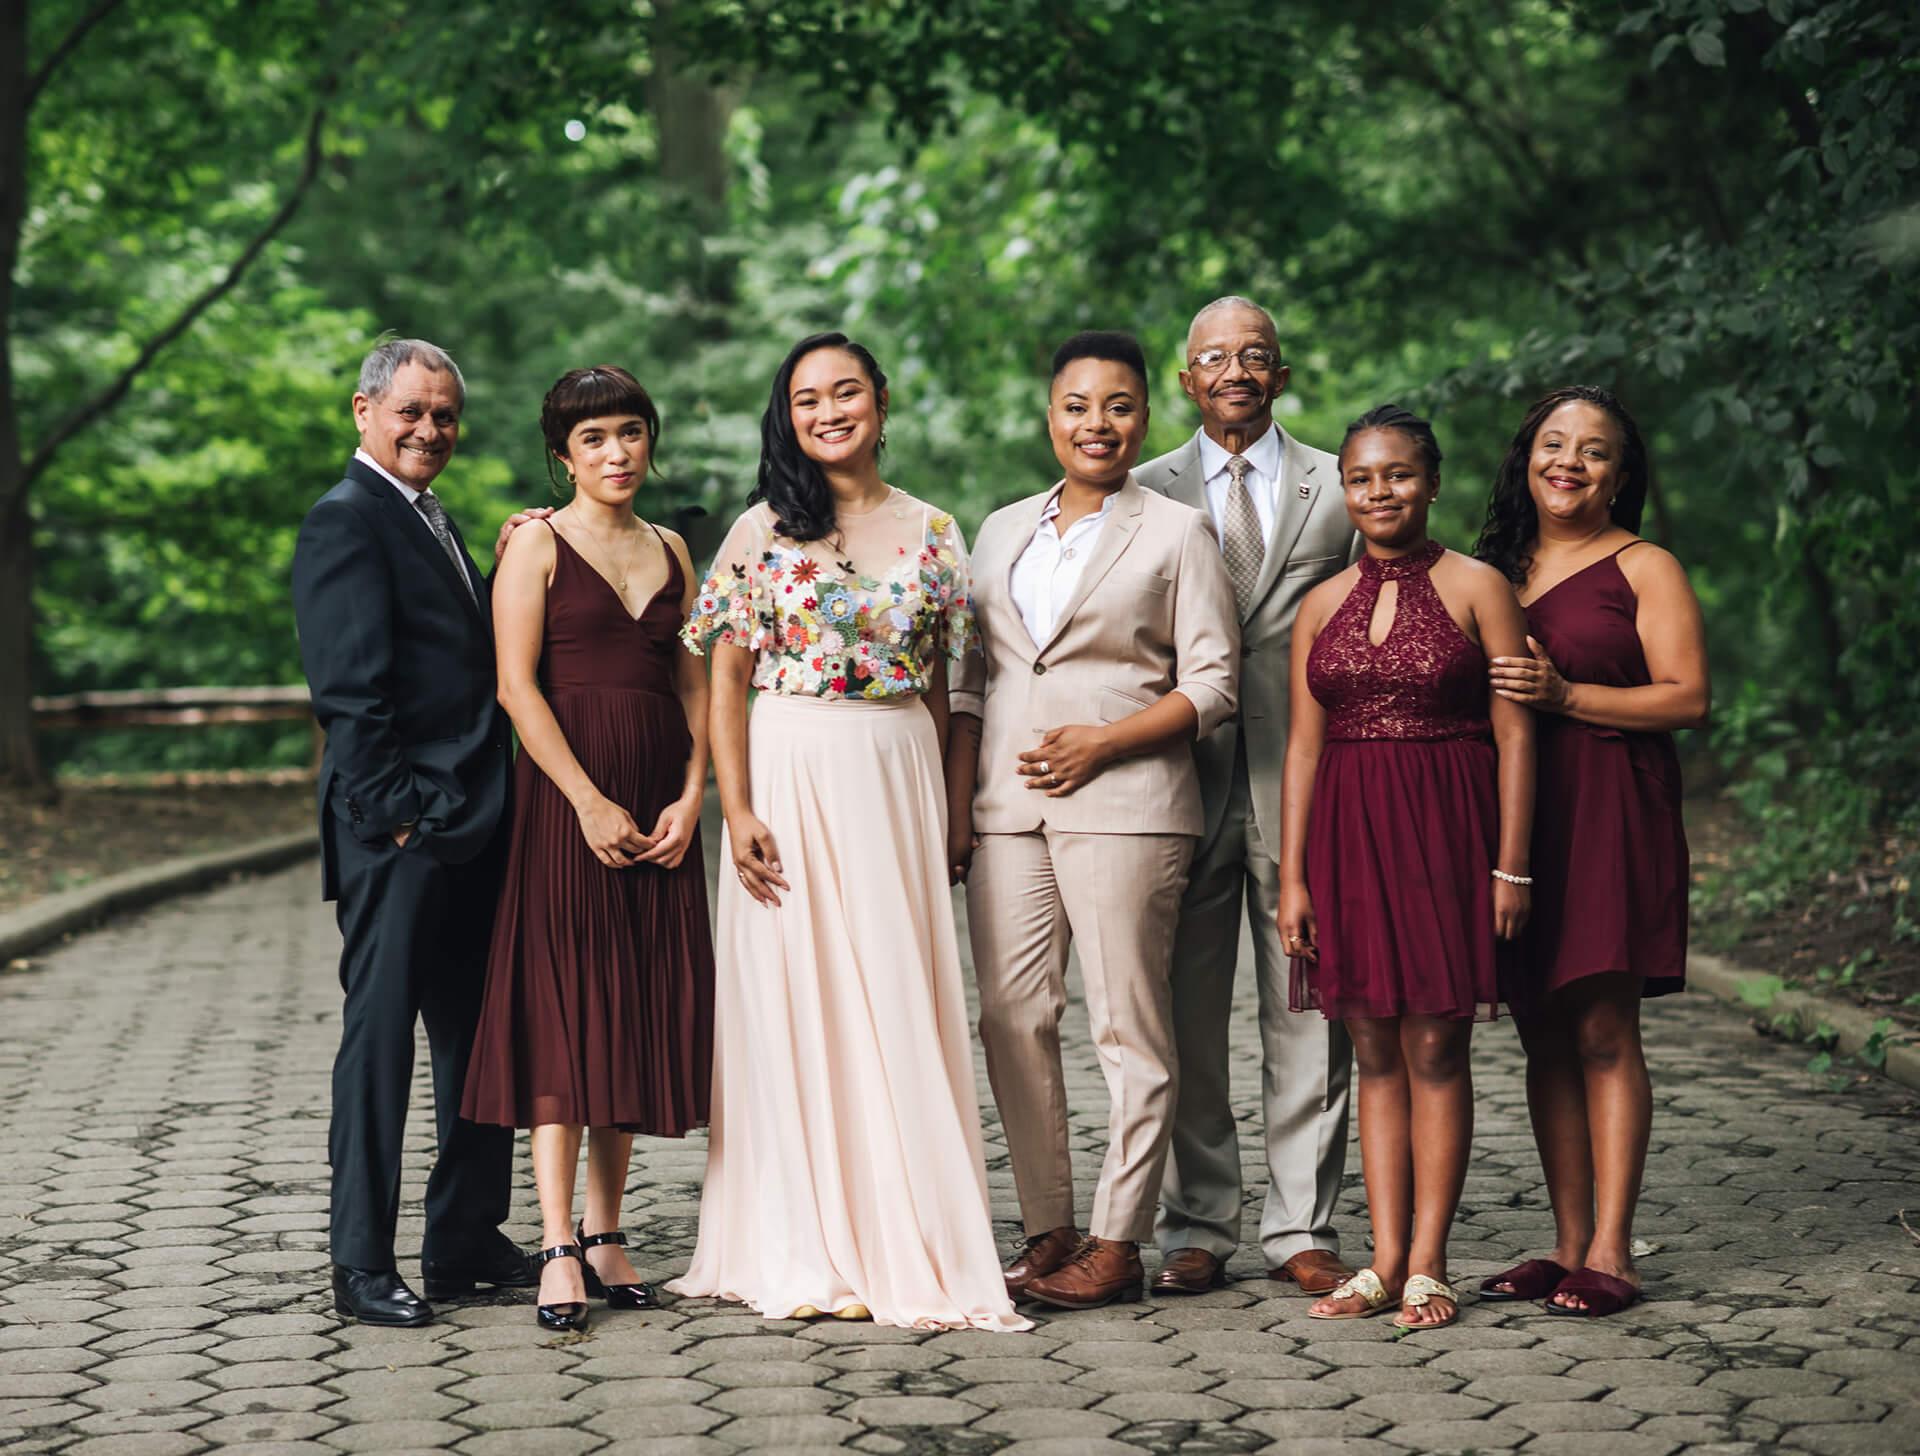 BROOKLYN SOCIETY FOR ETHICAL CULTURE - INTIMATE WEDDING - CHI-CHI ARI-131.jpg